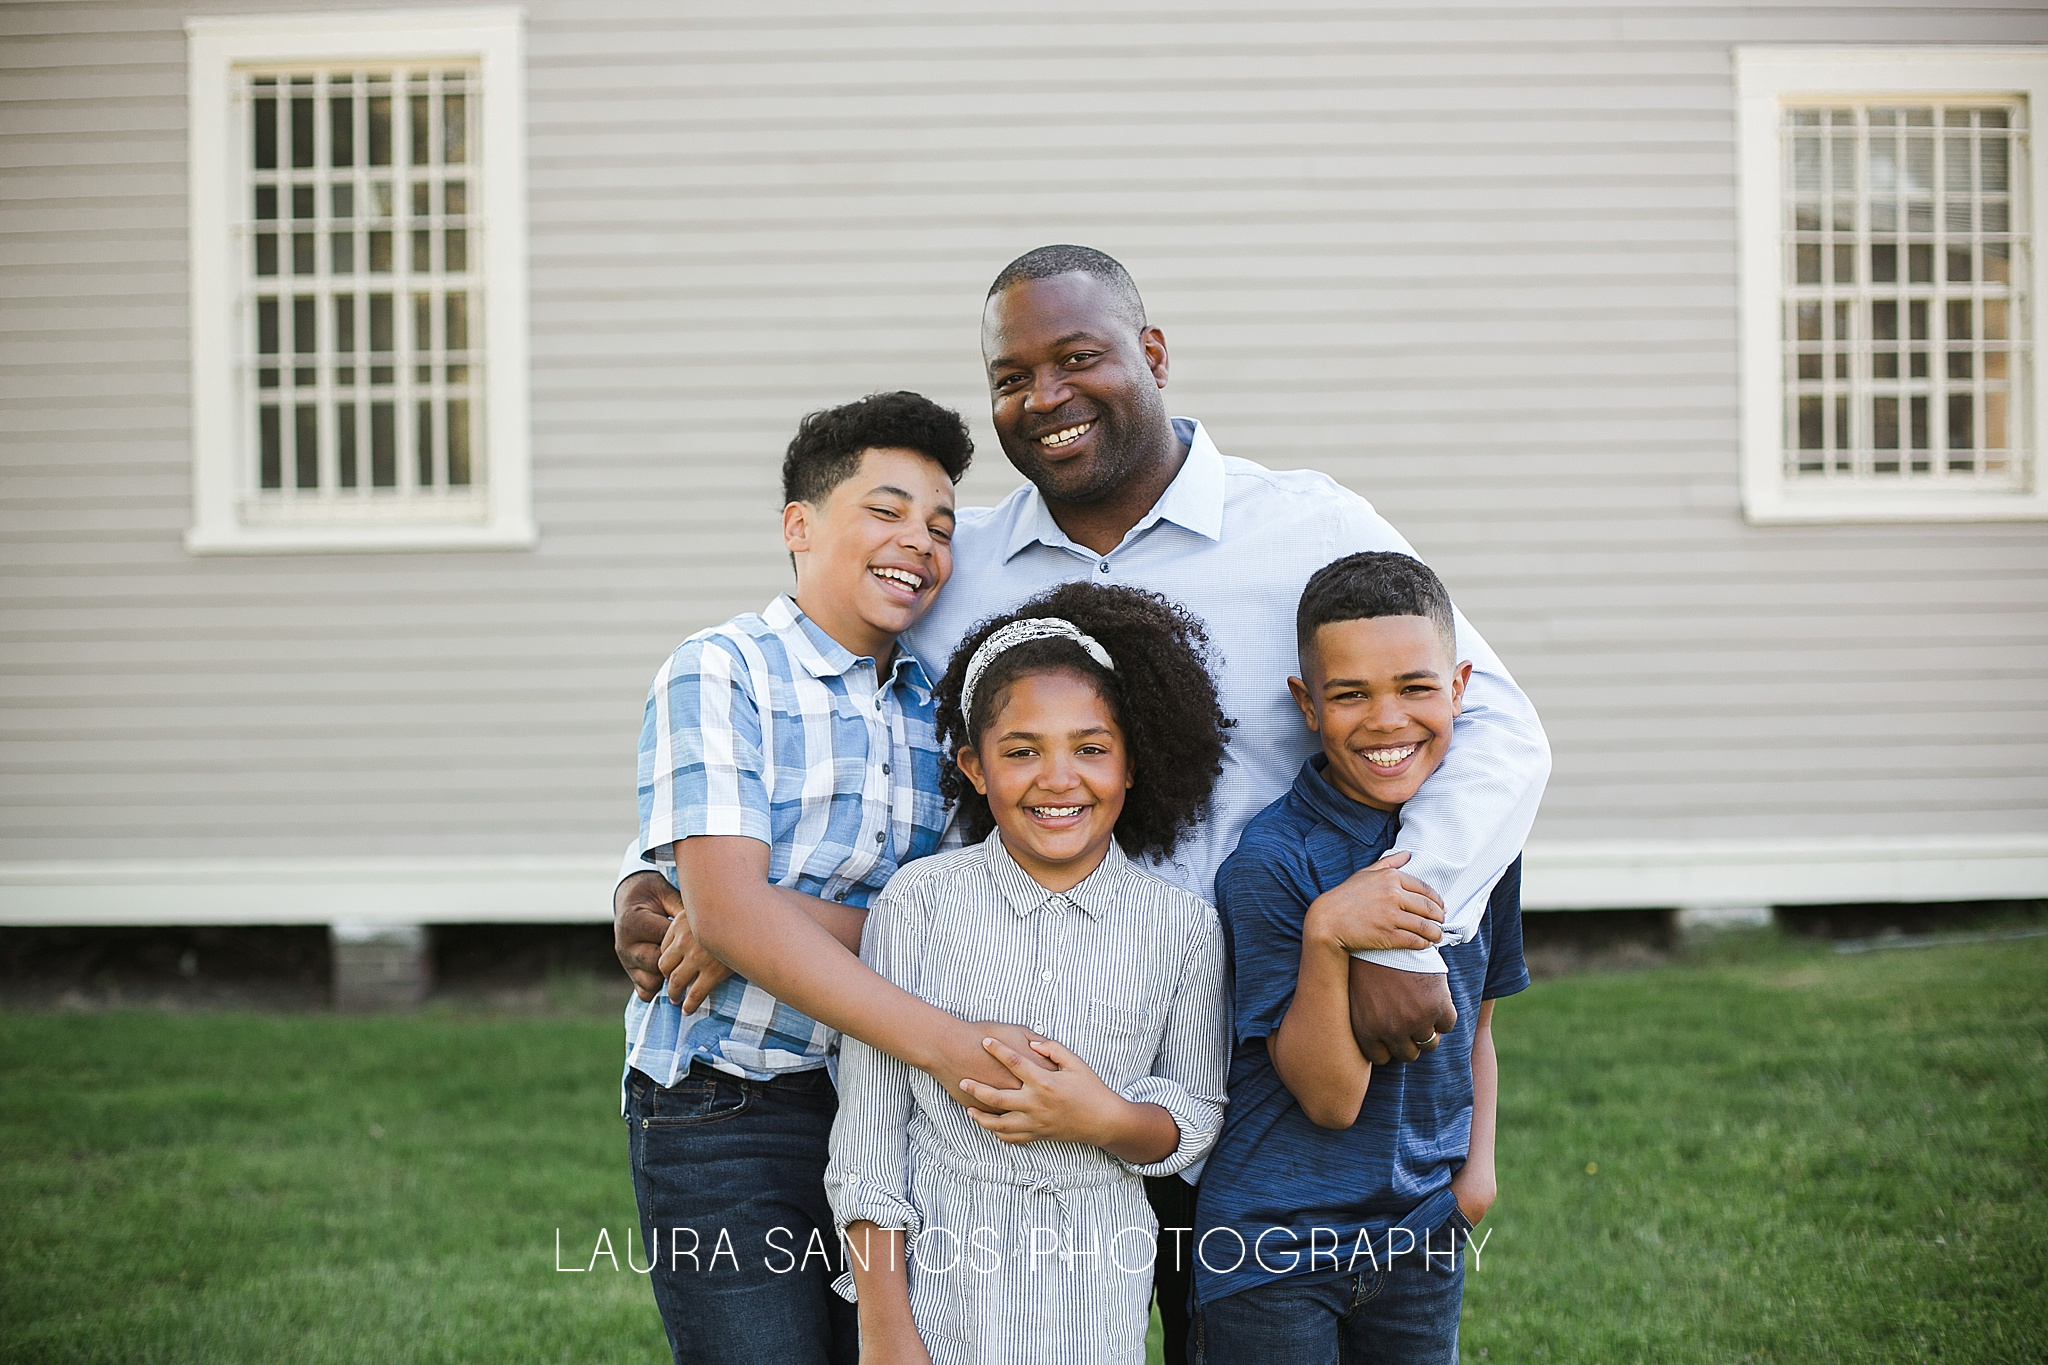 Laura Santos Photography Portland Oregon Family Photographer_0946.jpg